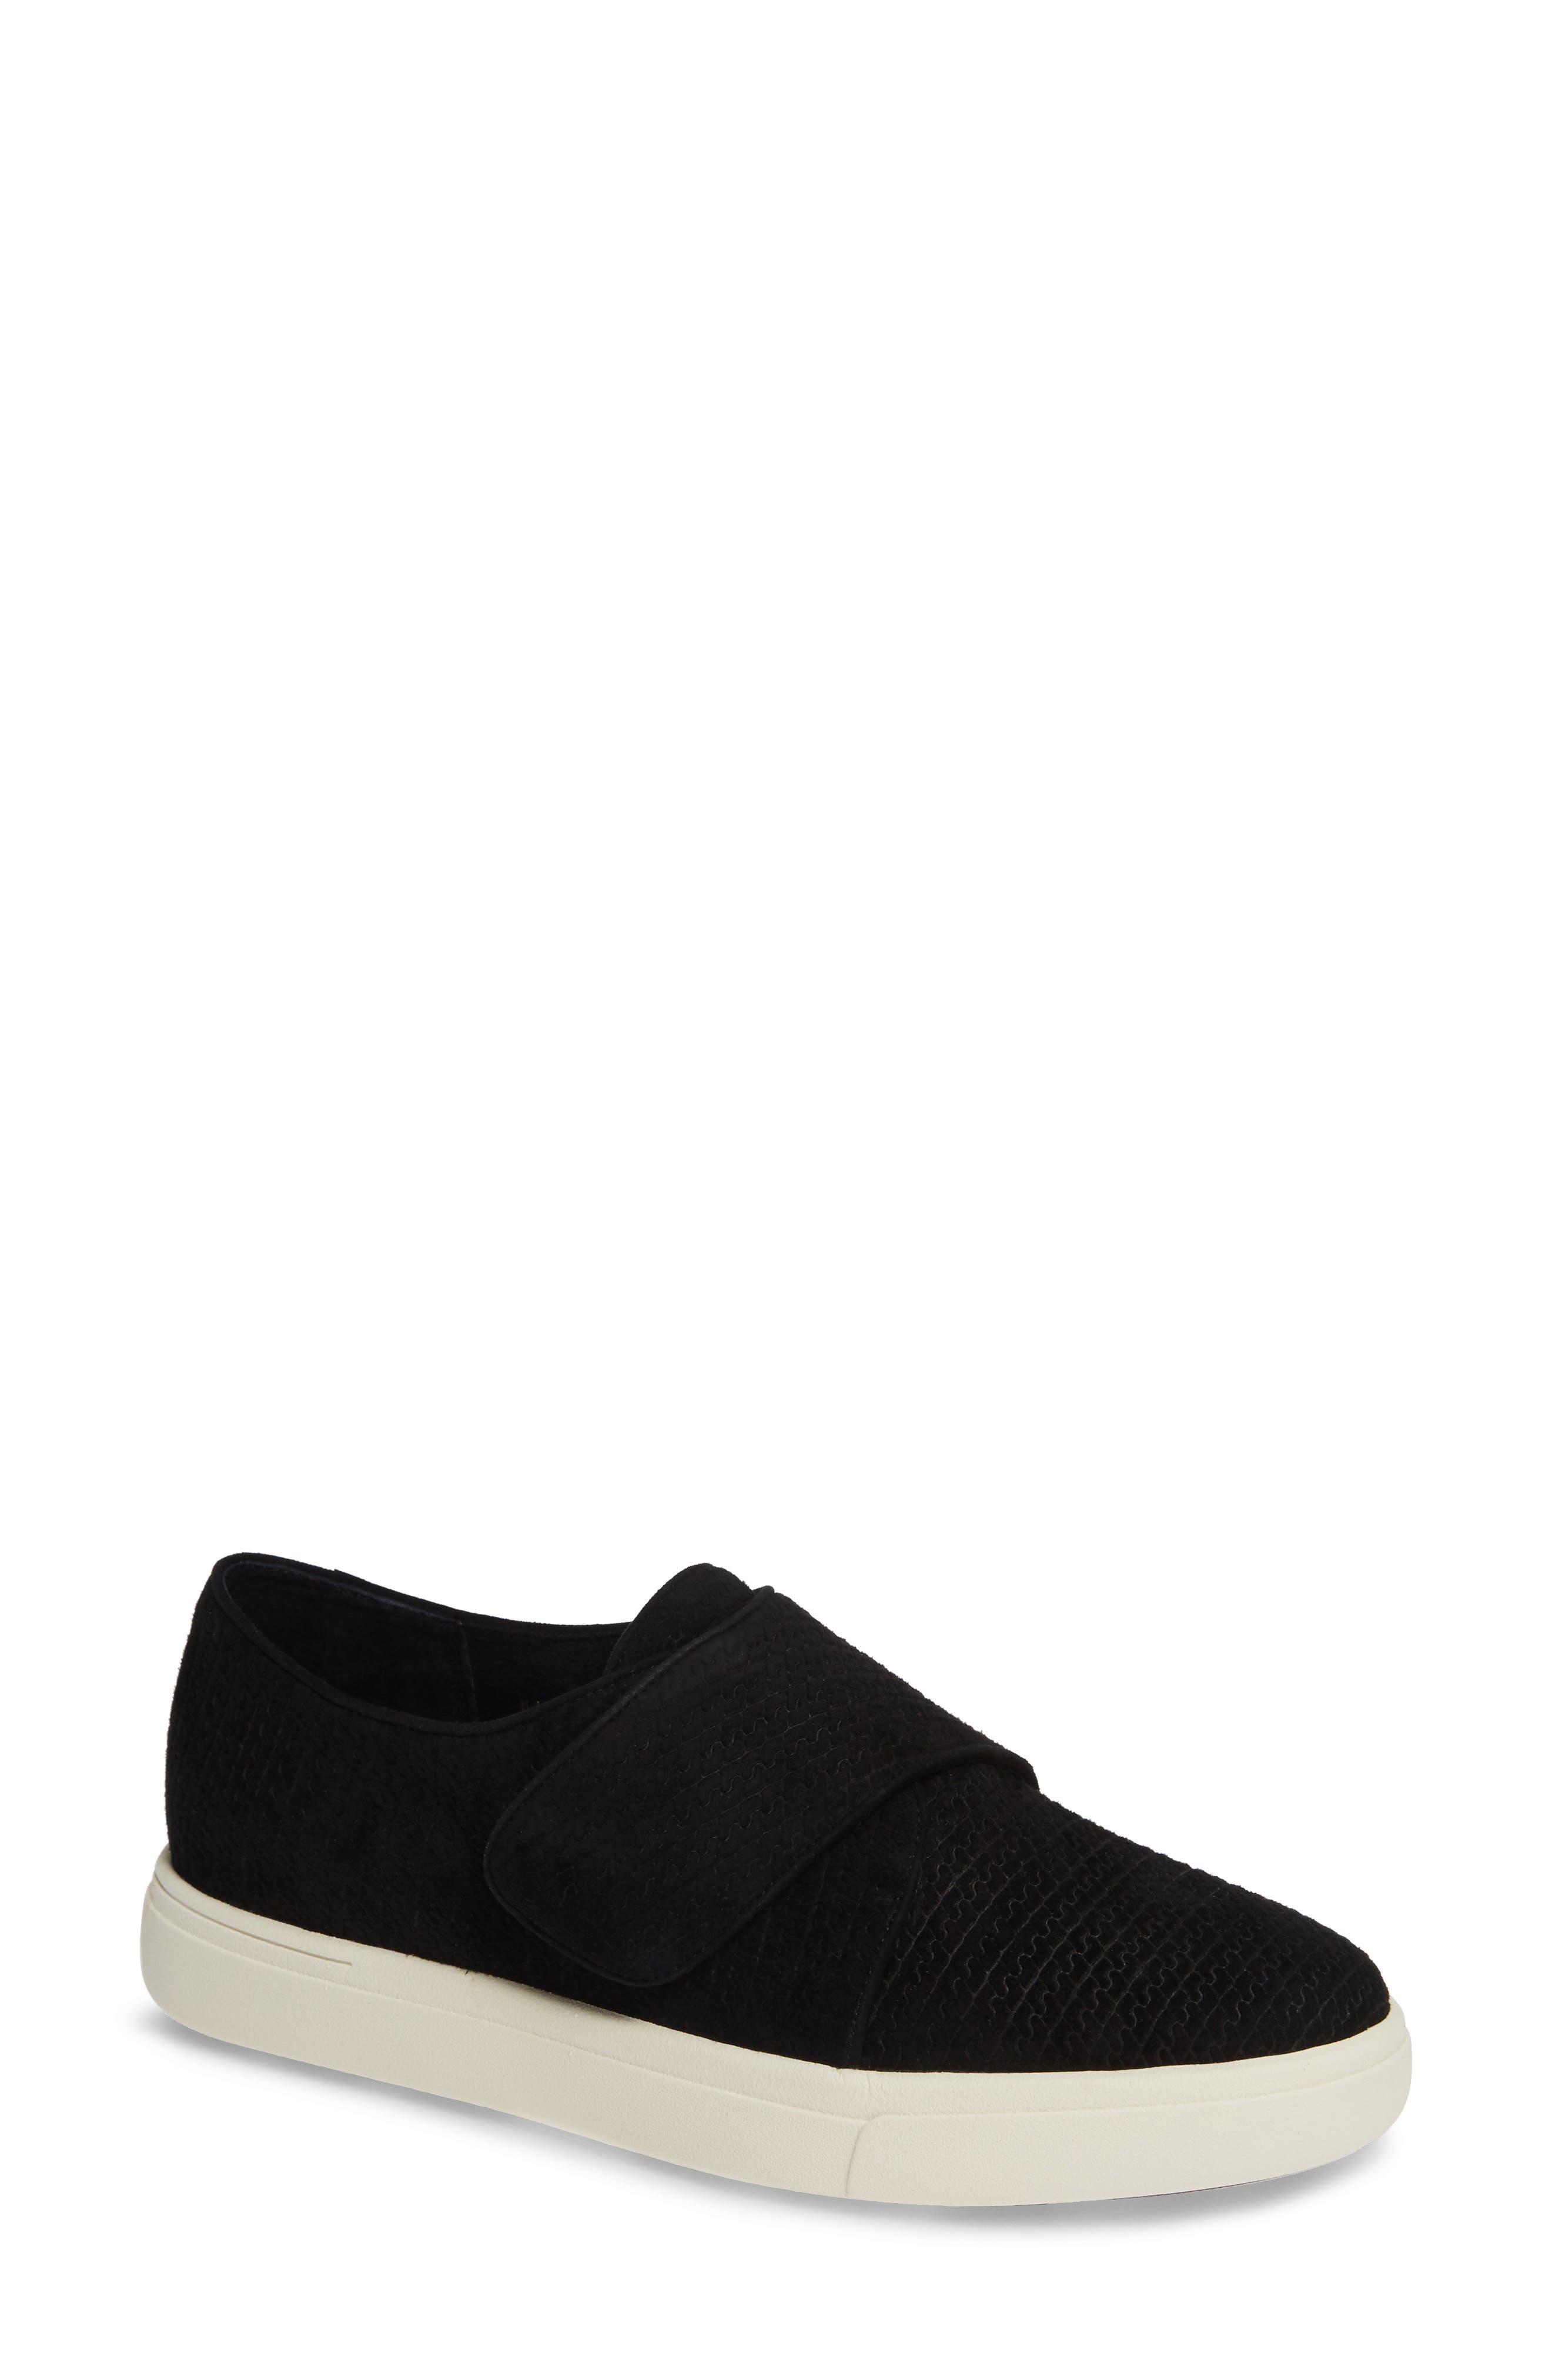 VANELI,                             Oberon Slip-On Sneaker,                             Main thumbnail 1, color,                             BLACK SUEDE